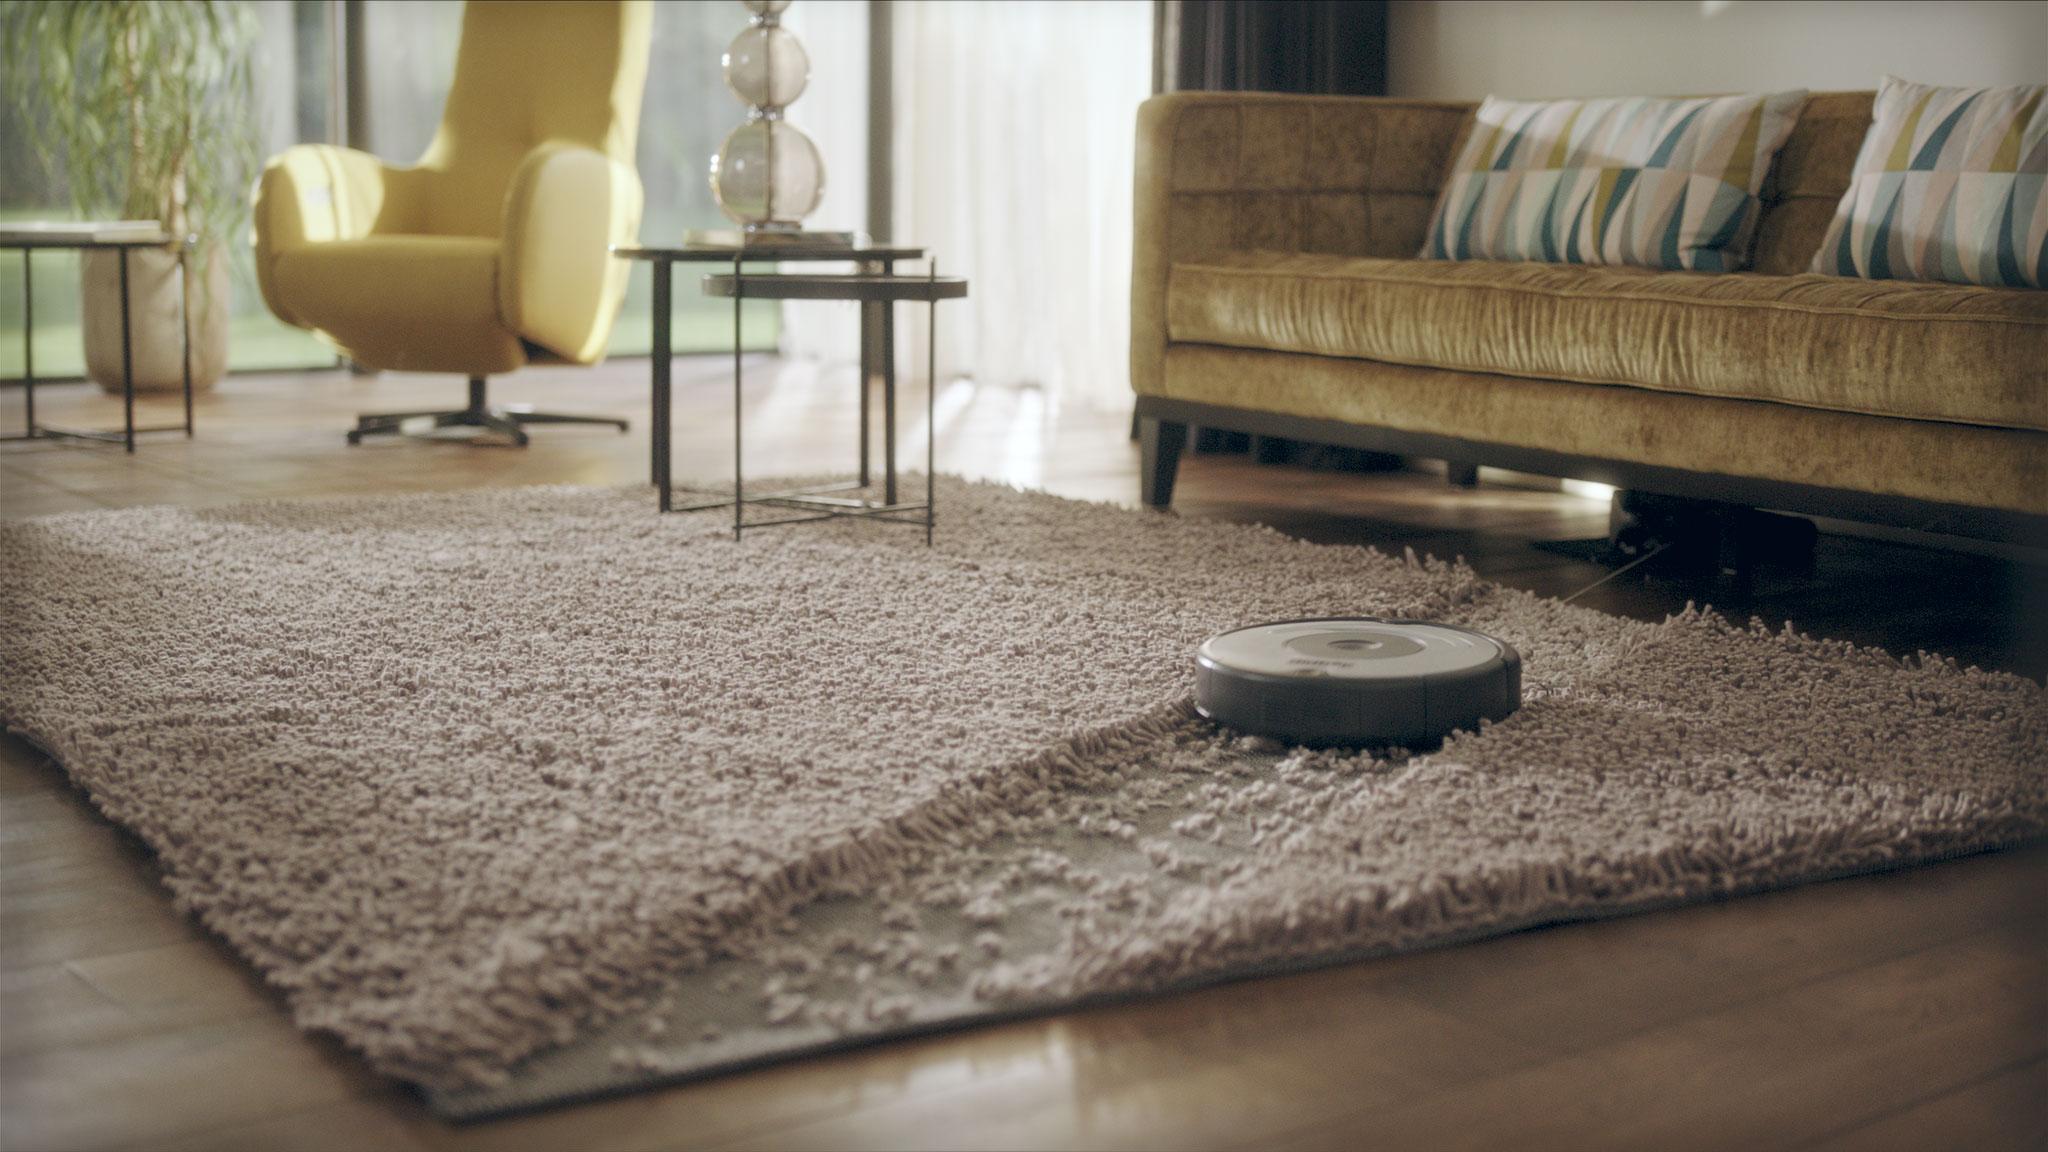 Before-Carpet Particles